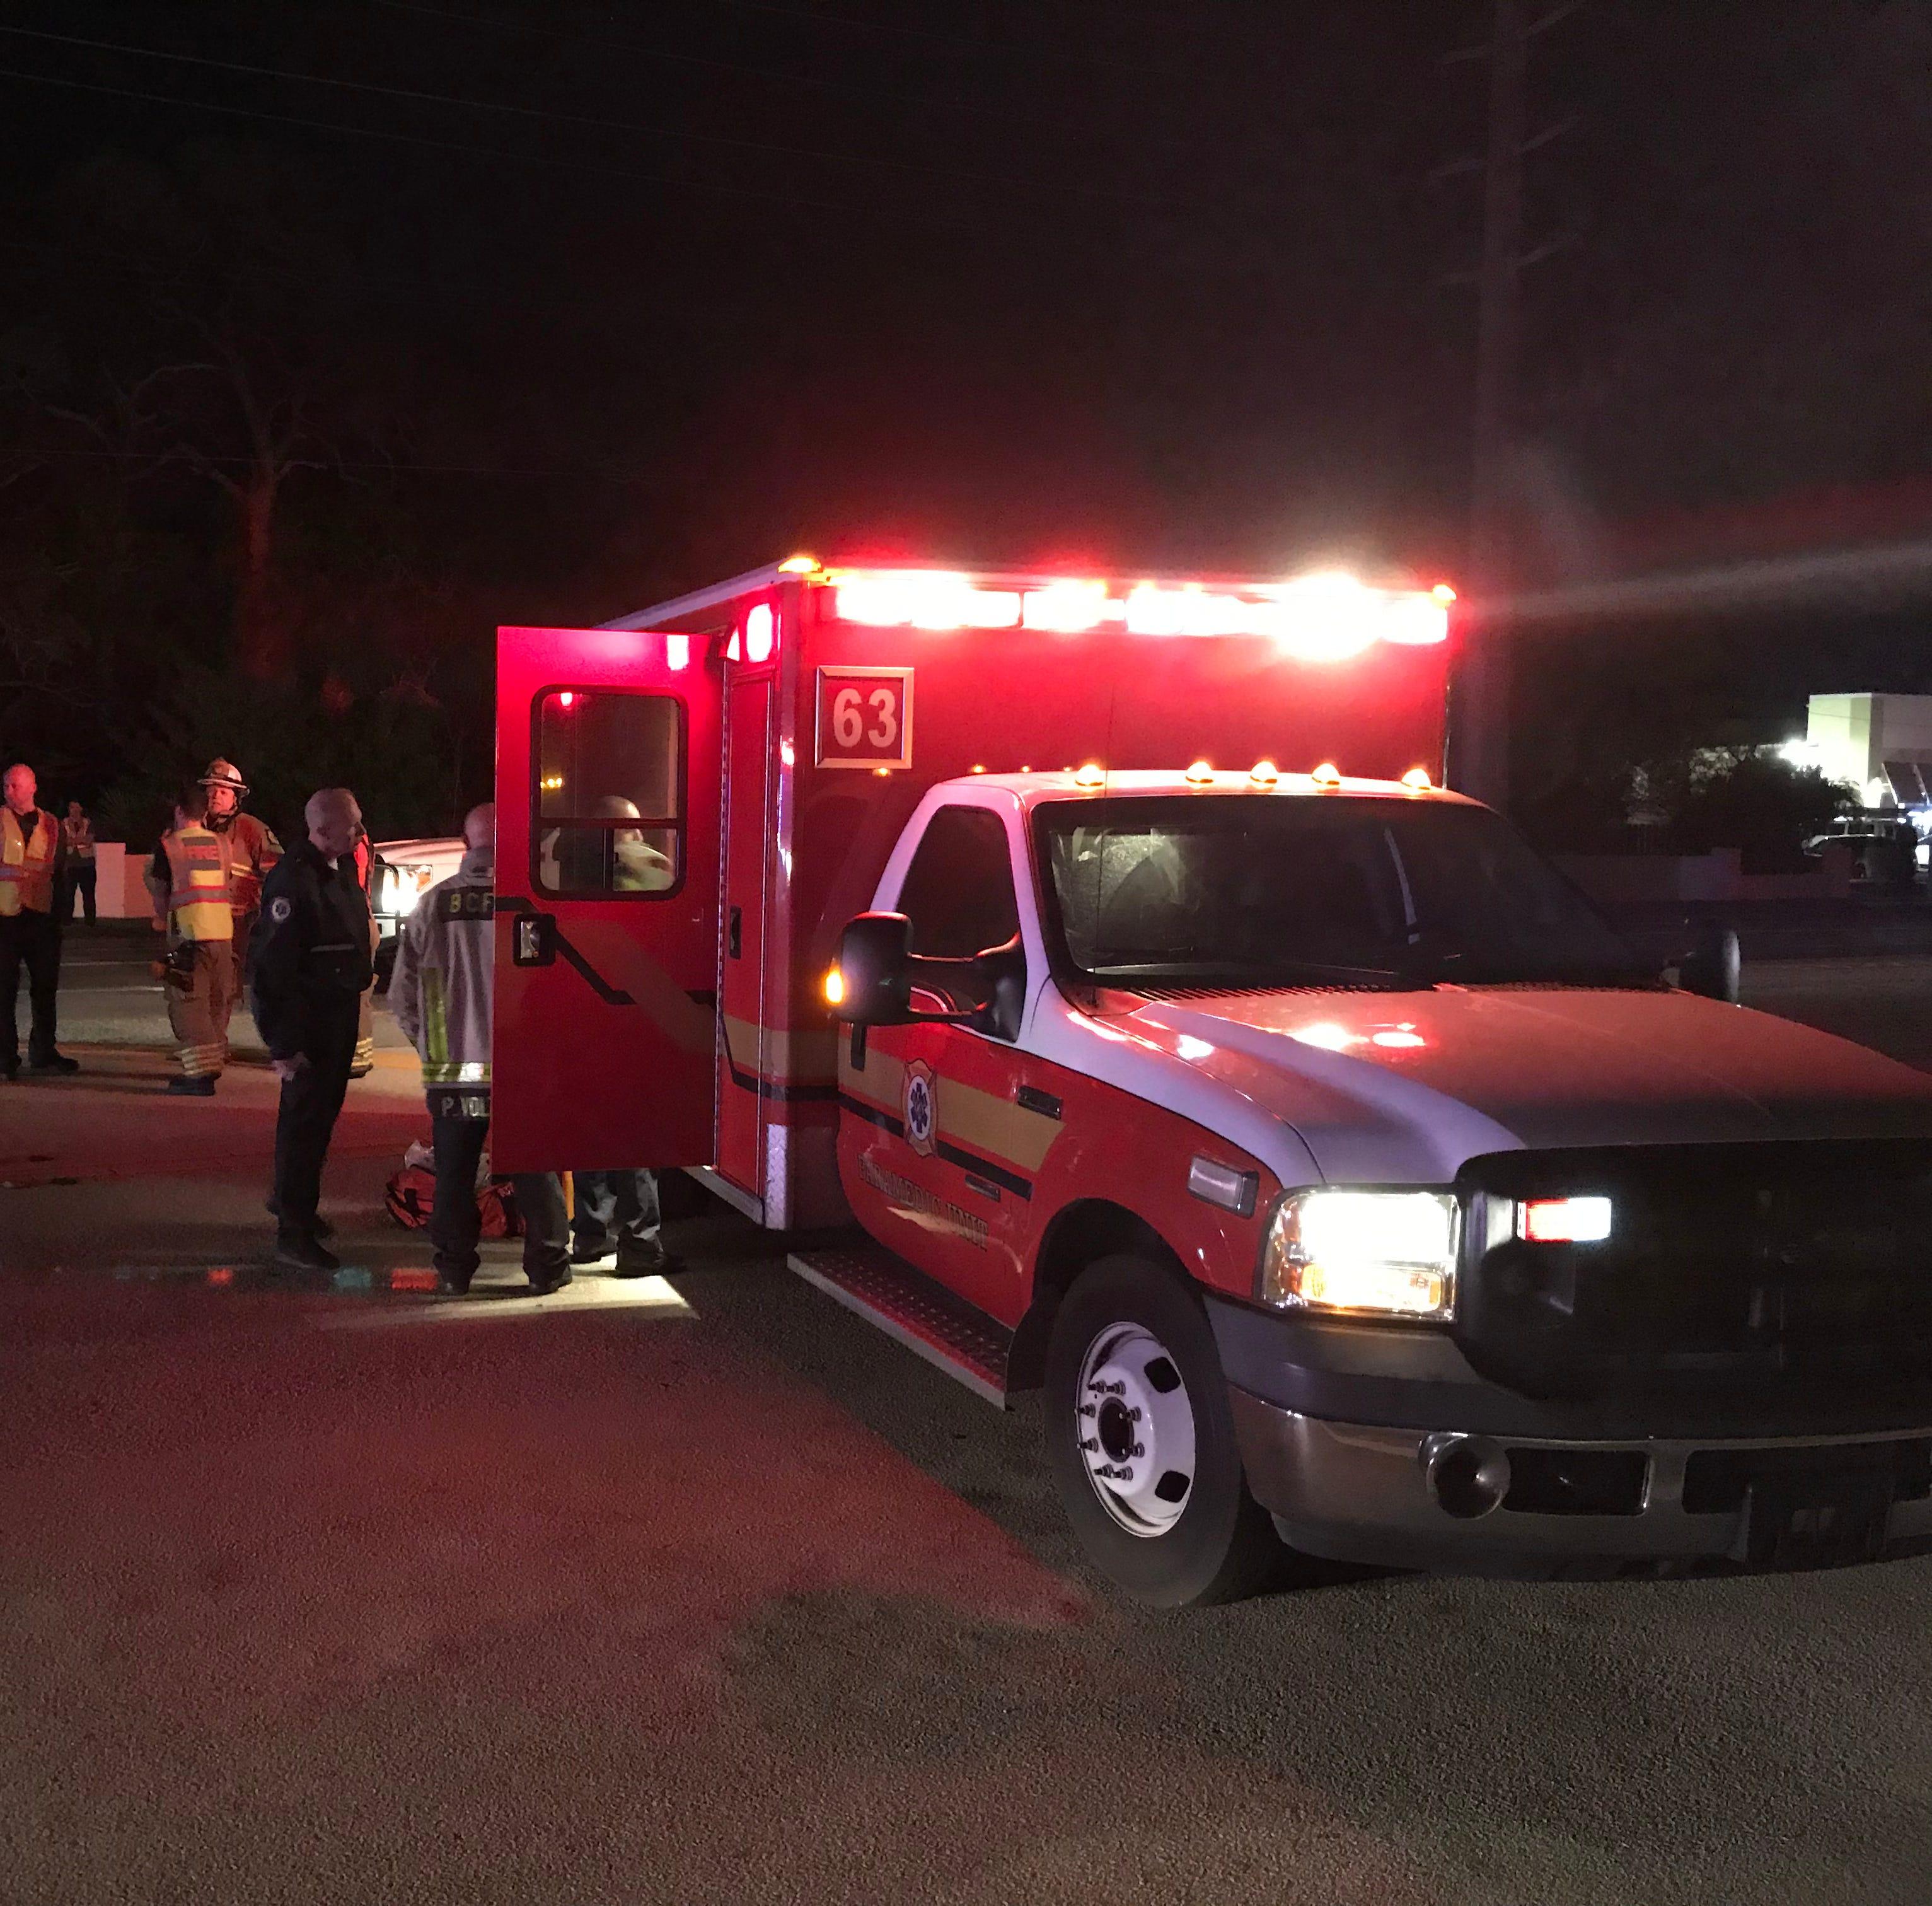 2 children struck by vehicle during Santa Run event in Indian Harbour Beach